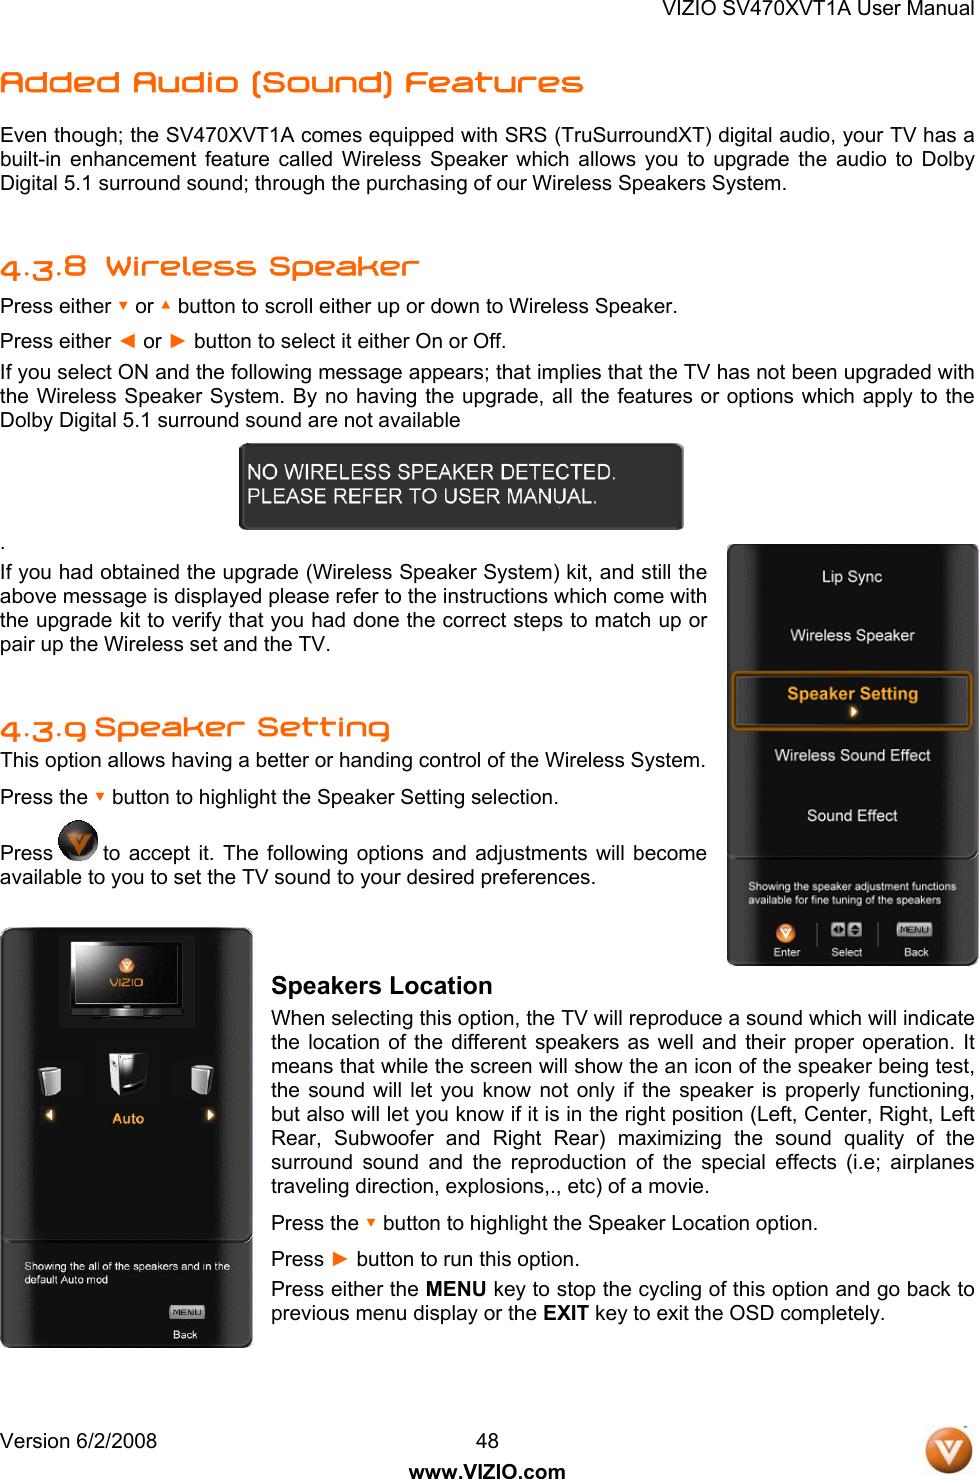 Vizio Sv470Xvt1A Users Manual